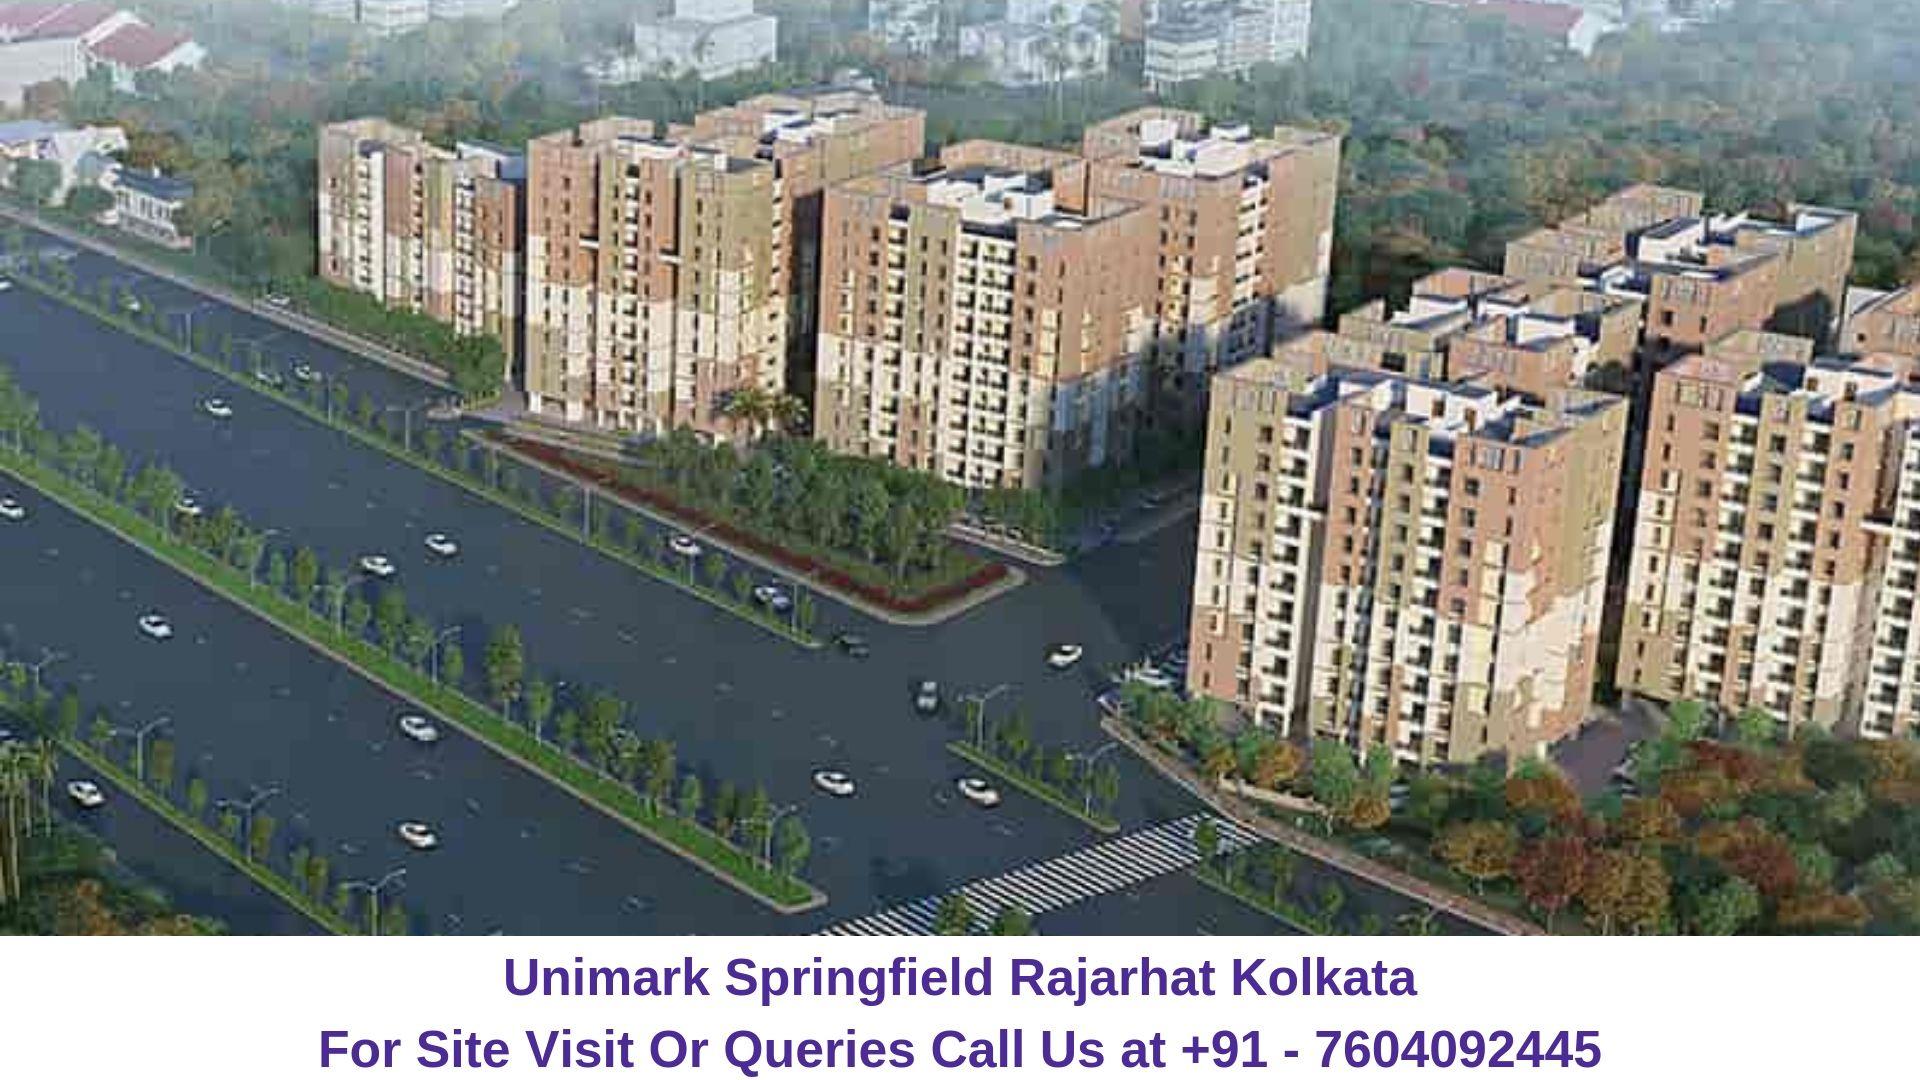 Unimark Springfield Rajarhat Kolkata